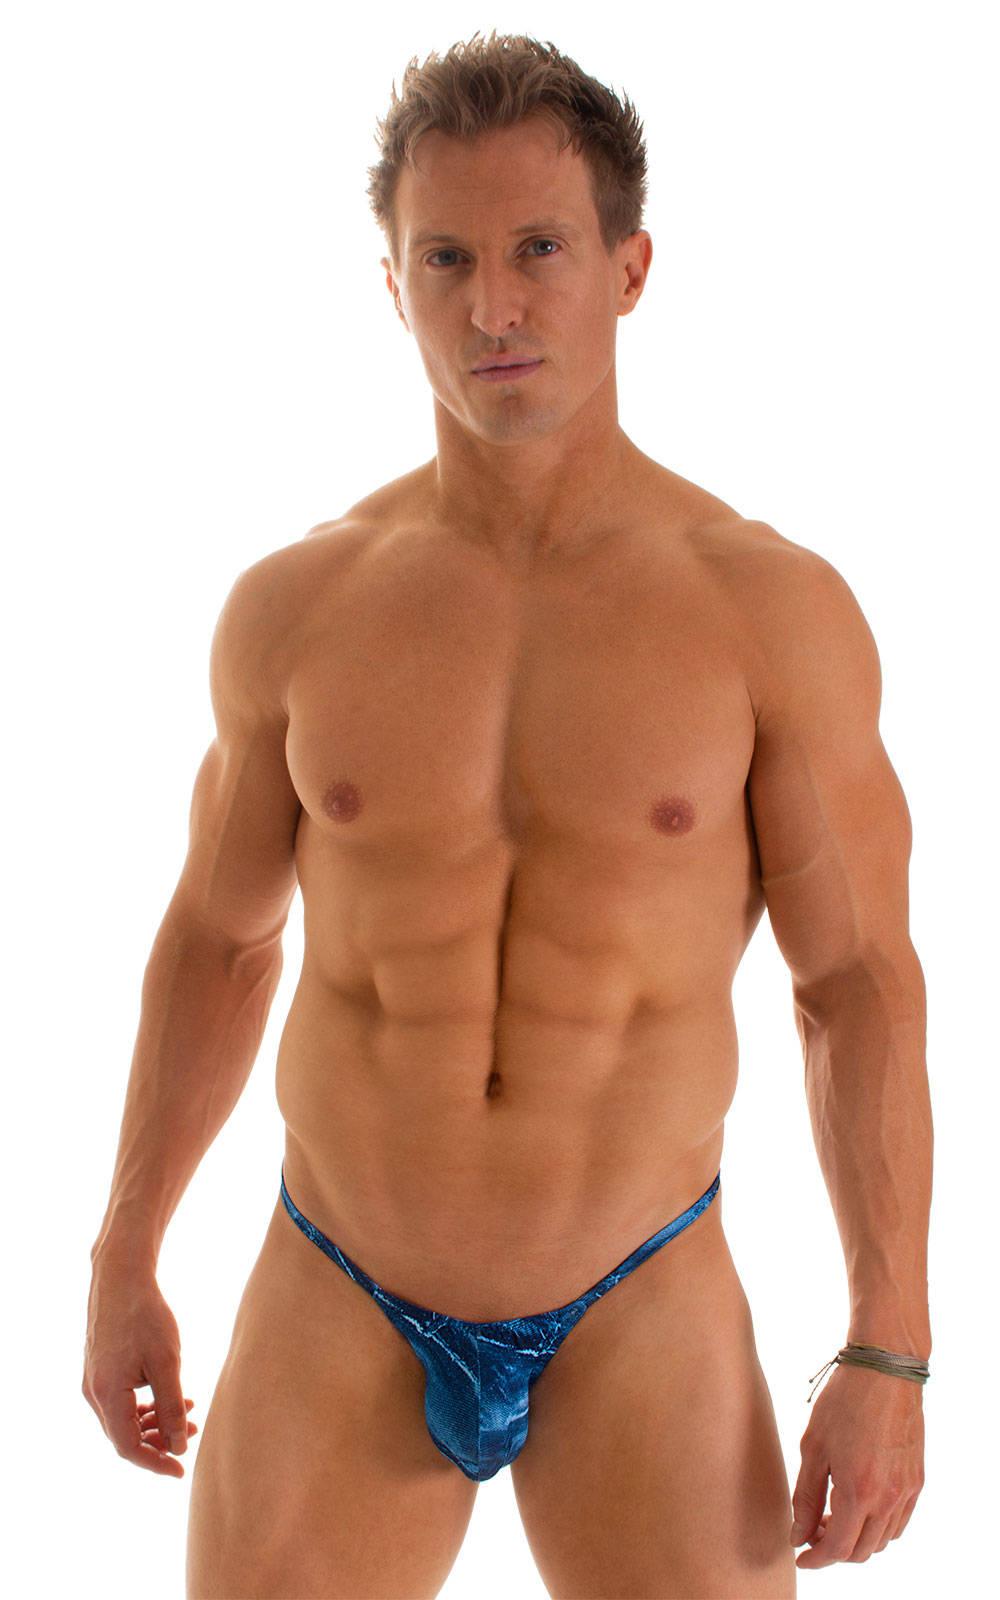 Micro Pouch - Puckered Back - Rio Bikini in Super ThinSkinz Denim Patches 1